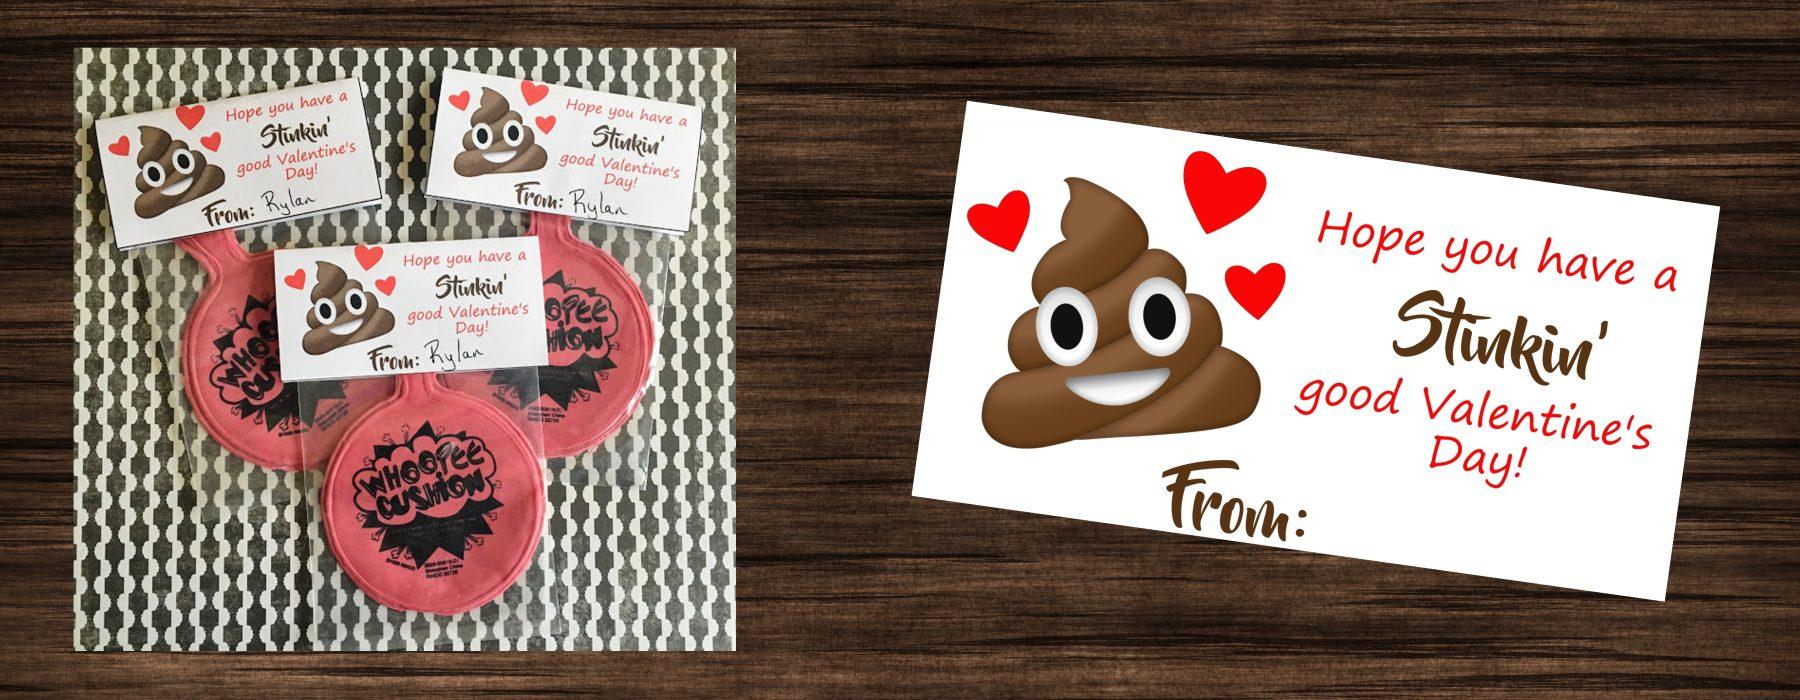 Nice Whoopee Cushion Valentine Ideas   Valentine Gift Ideas .